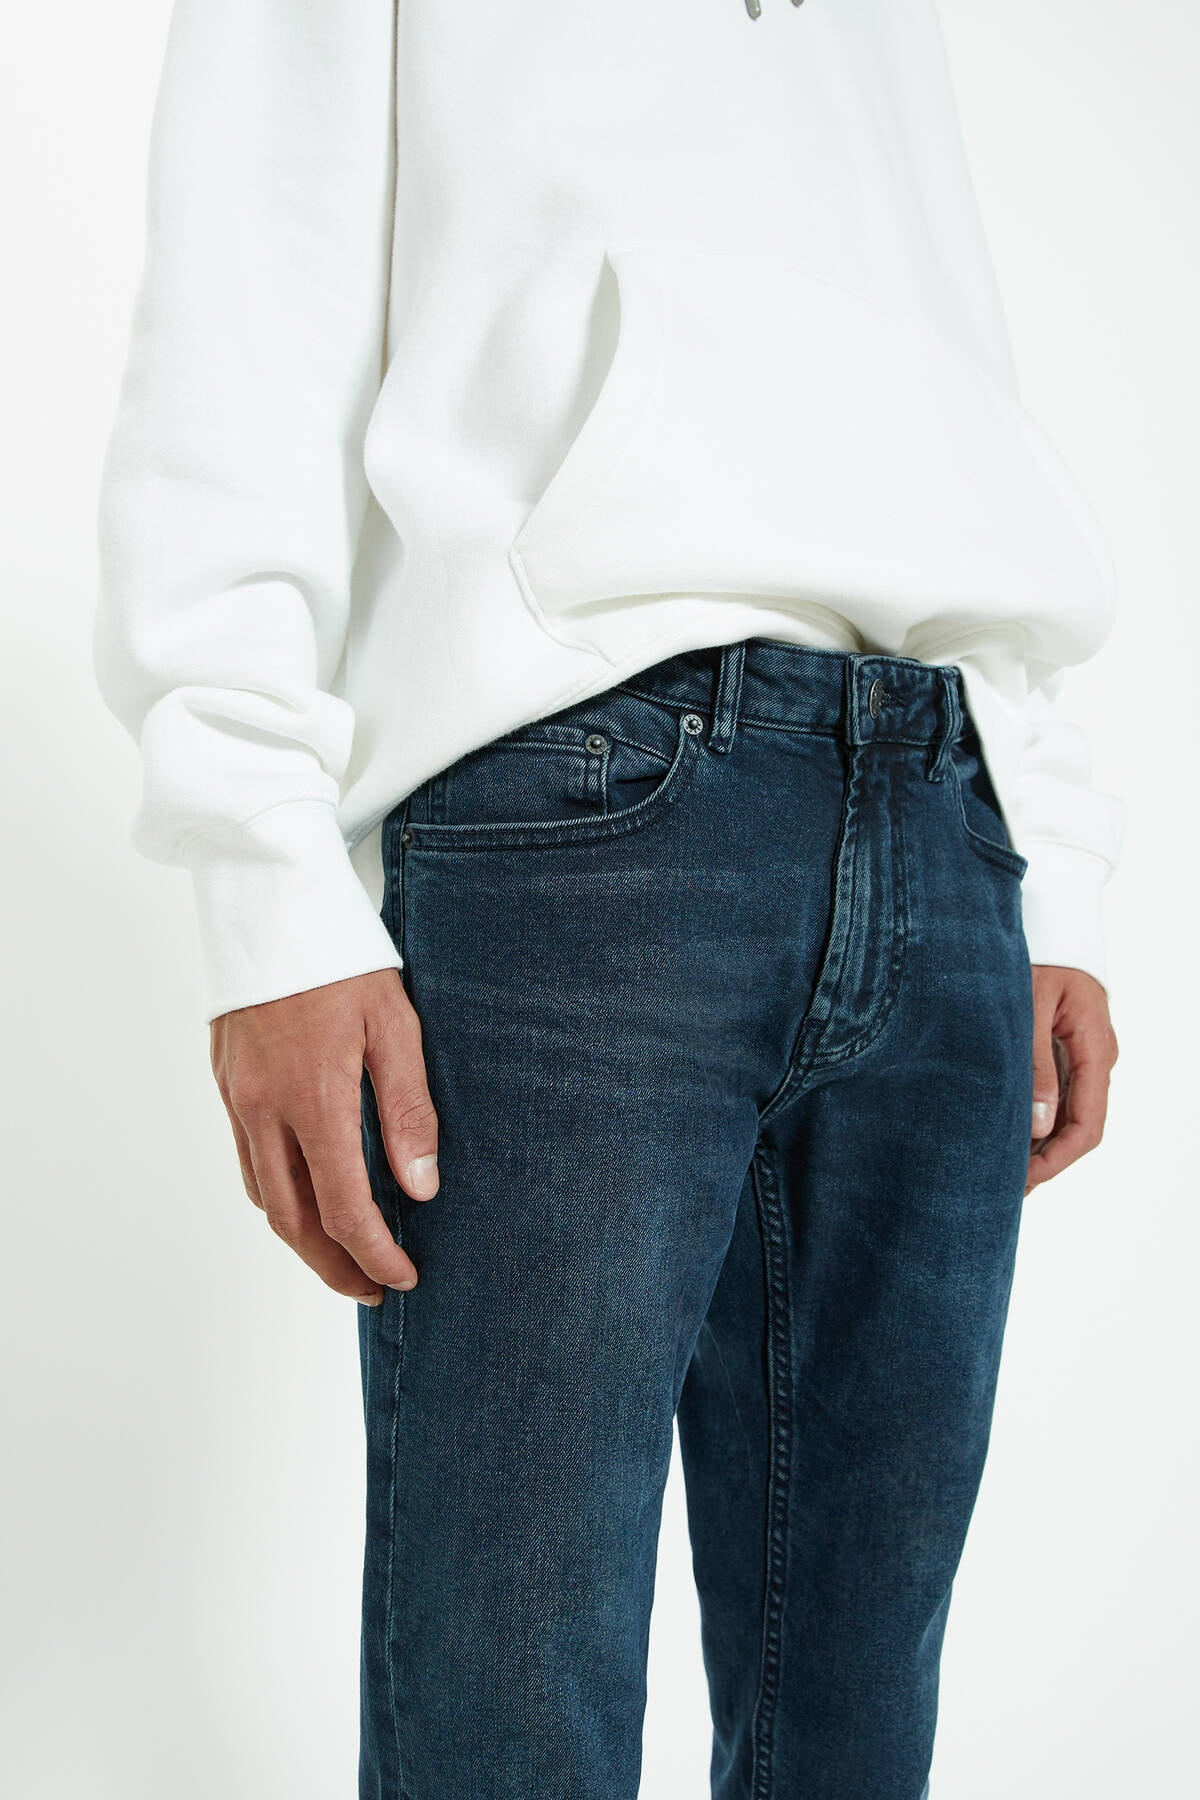 Pull & Bear Erkek Lavanta Rengi Distressed Detaylı Comfort Slim Fit Jean 09683533 4